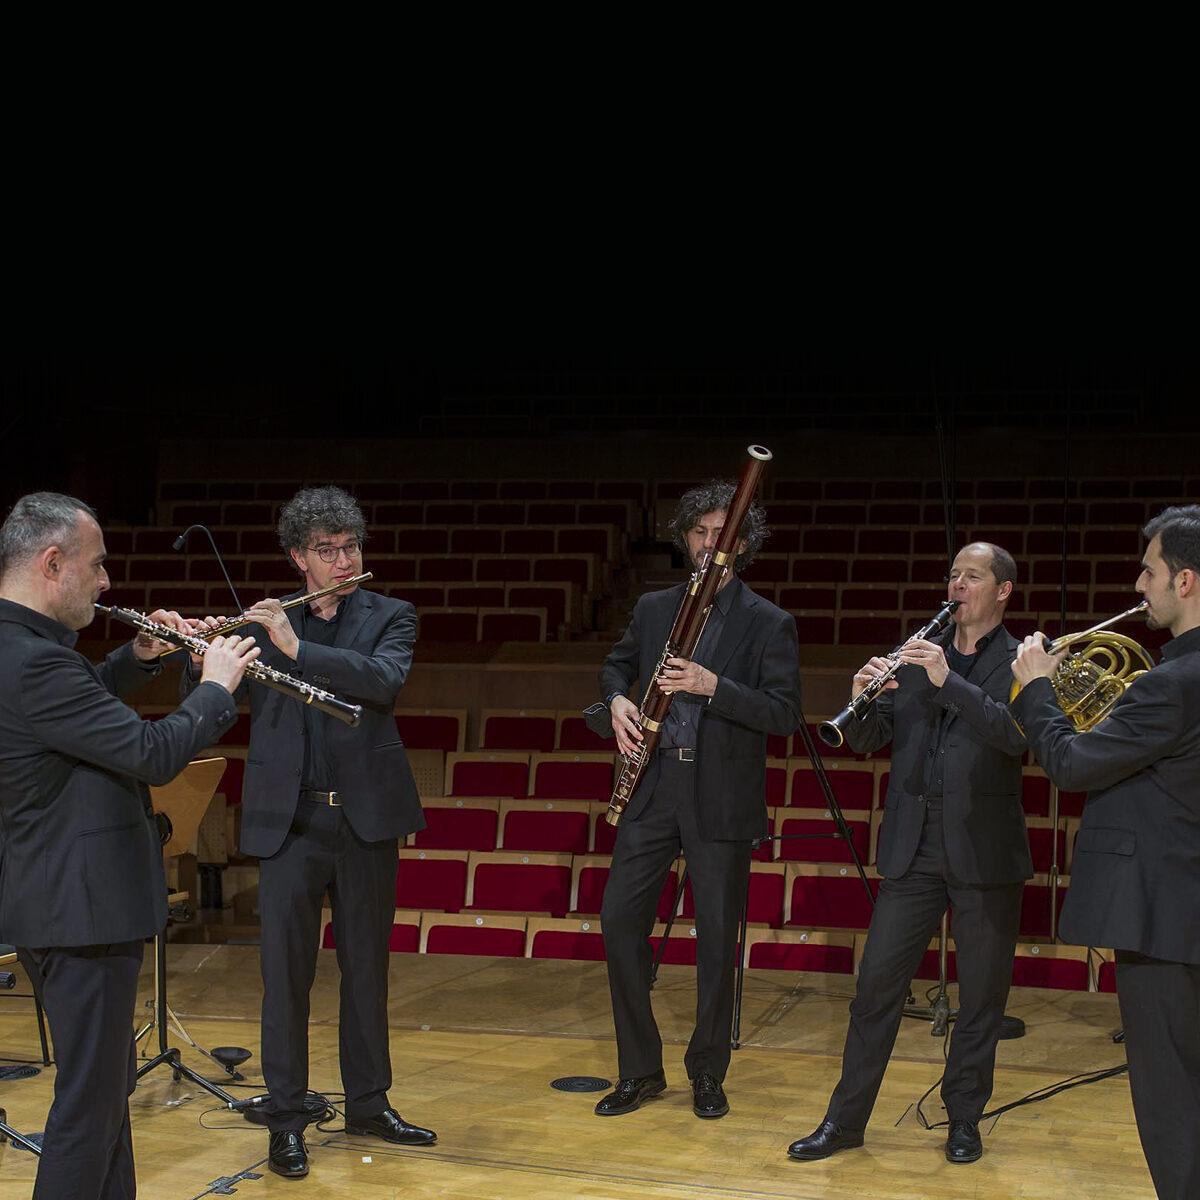 HAYDN_2021_StagioneSinfonica_Sito_Quintetto_1200x1200